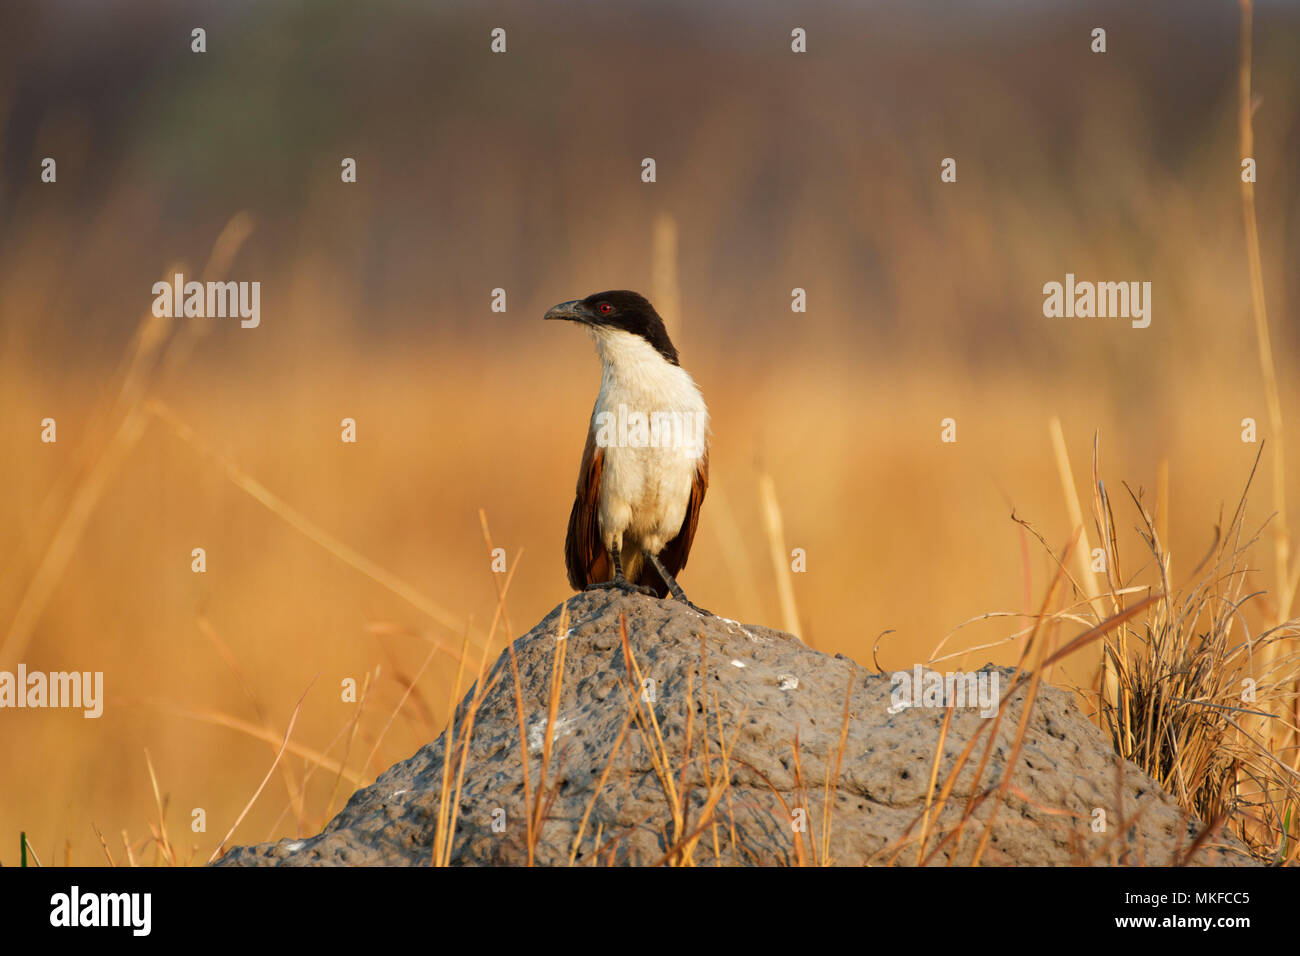 Coppery-tailed Coucal (Centropus cupreicaudus), Moremi, Botswana - Stock Image